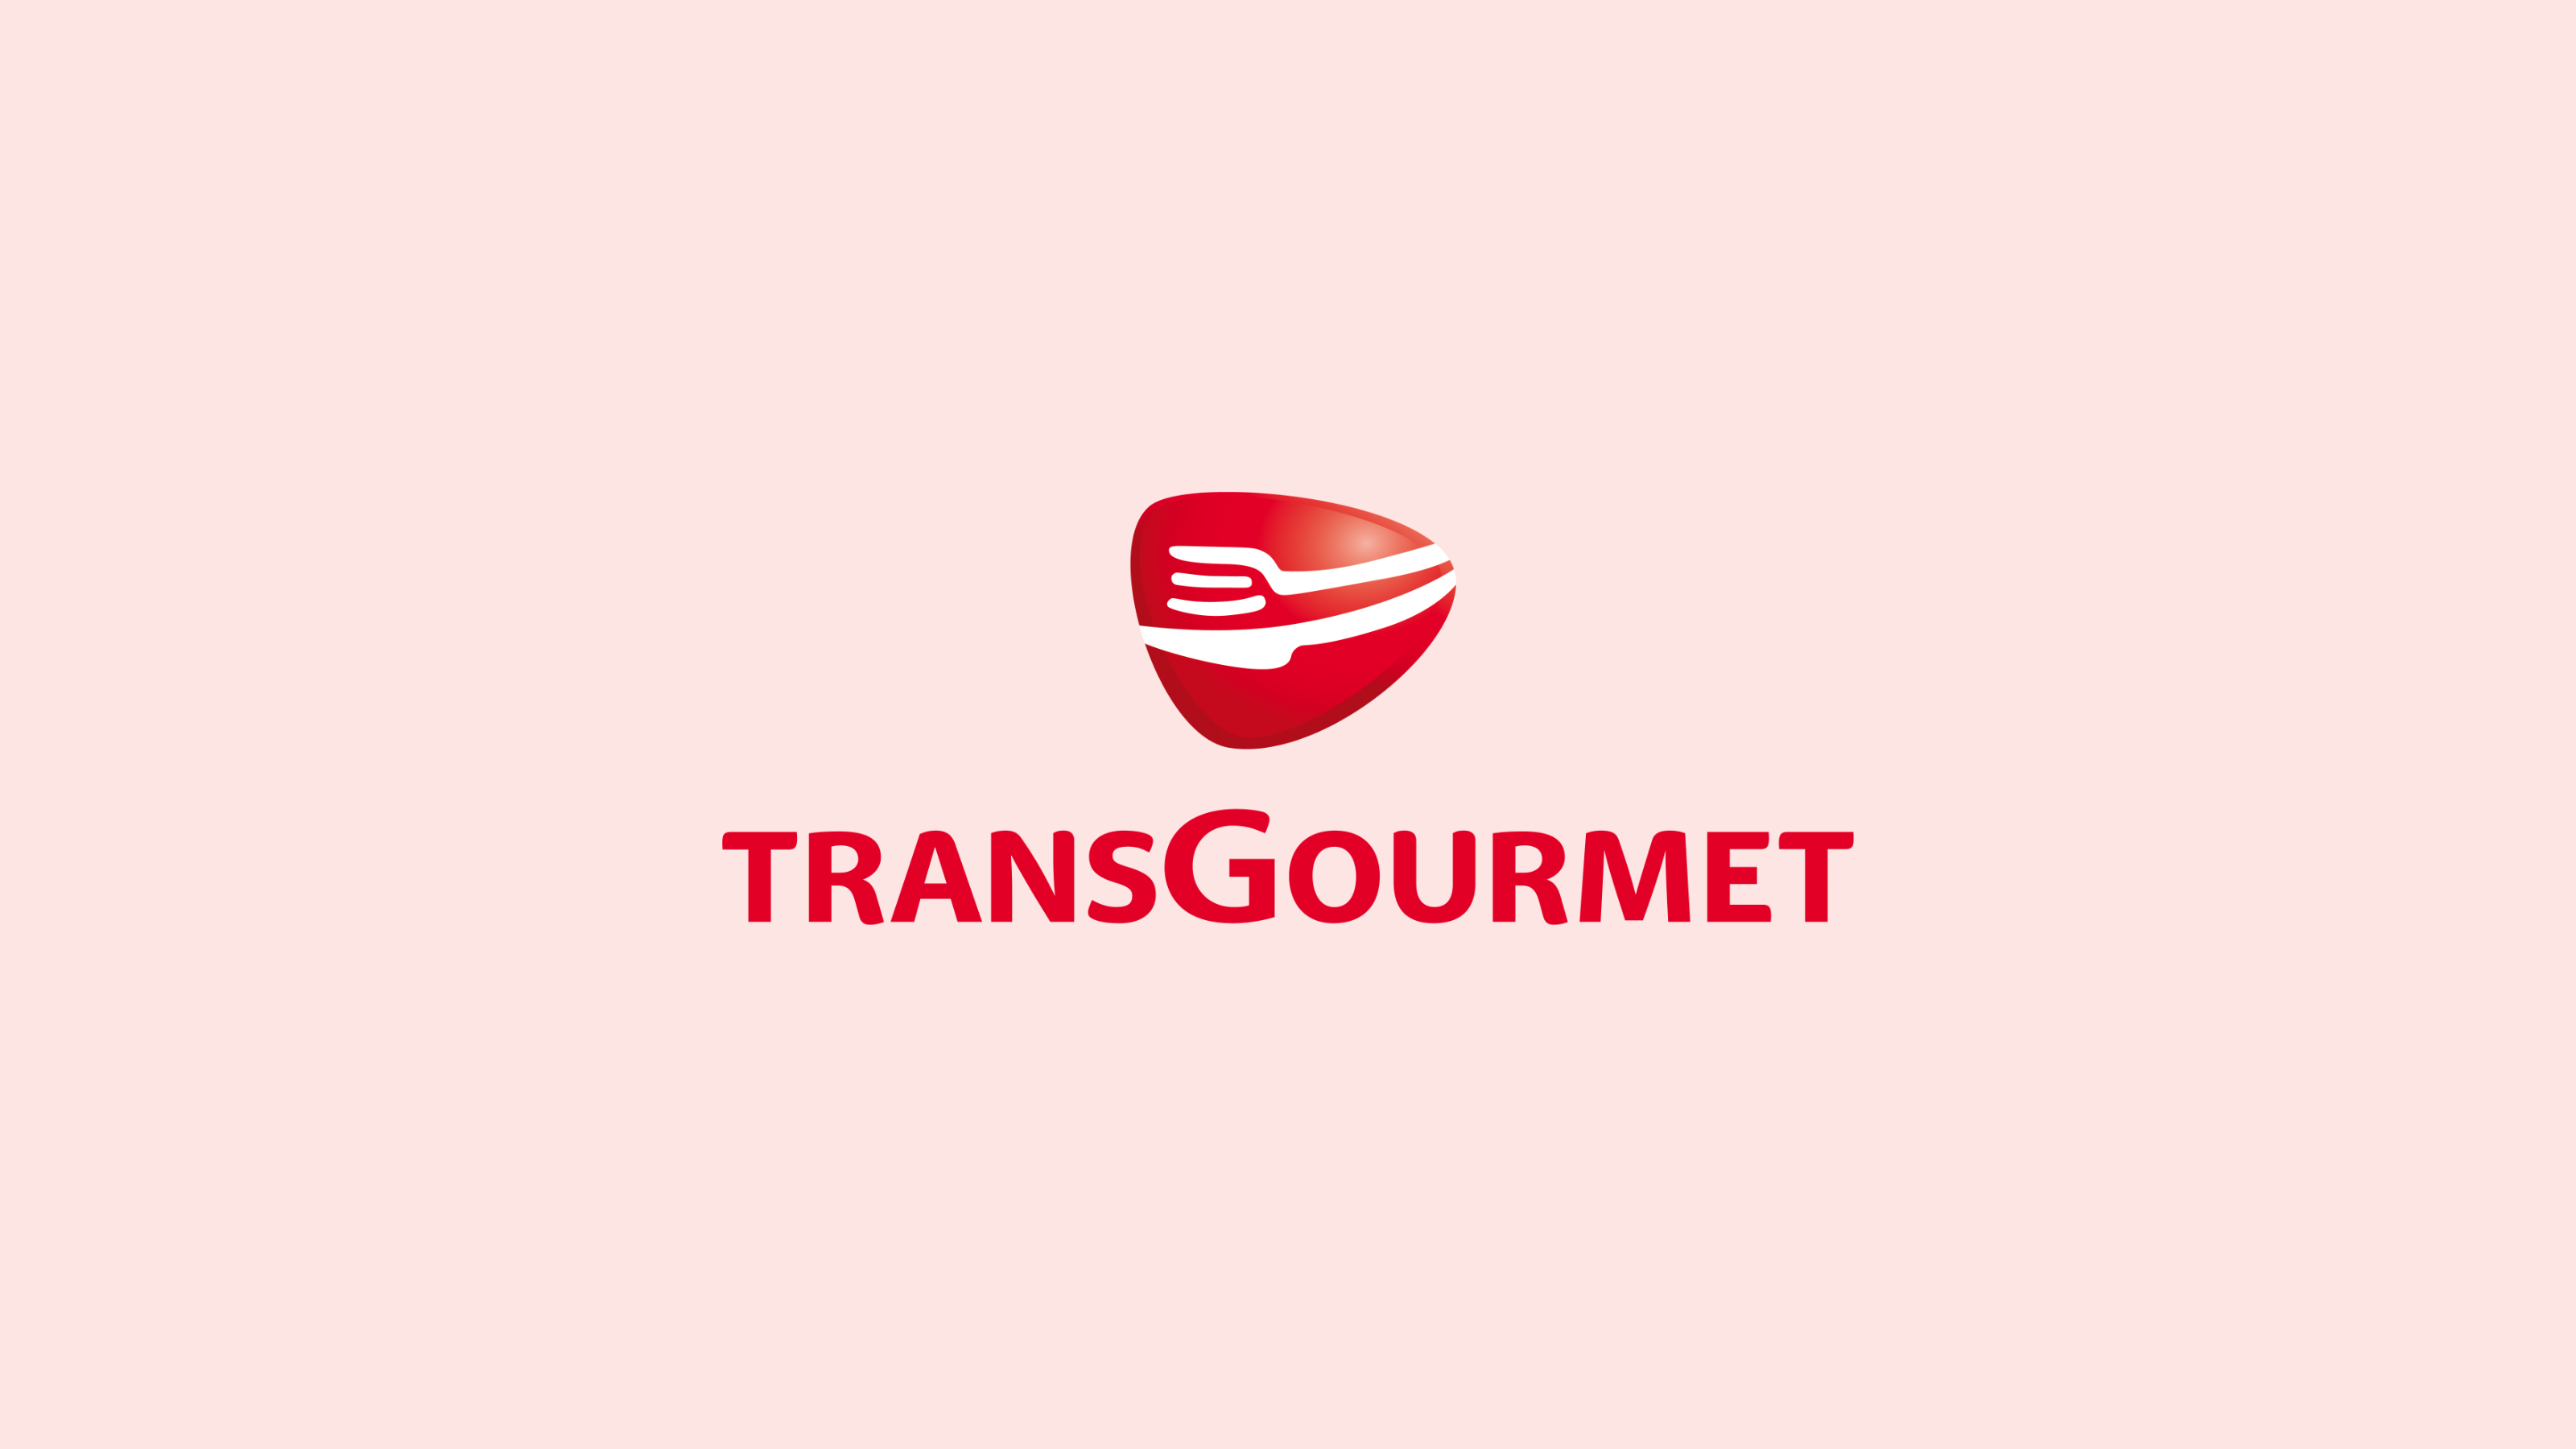 Transgourment